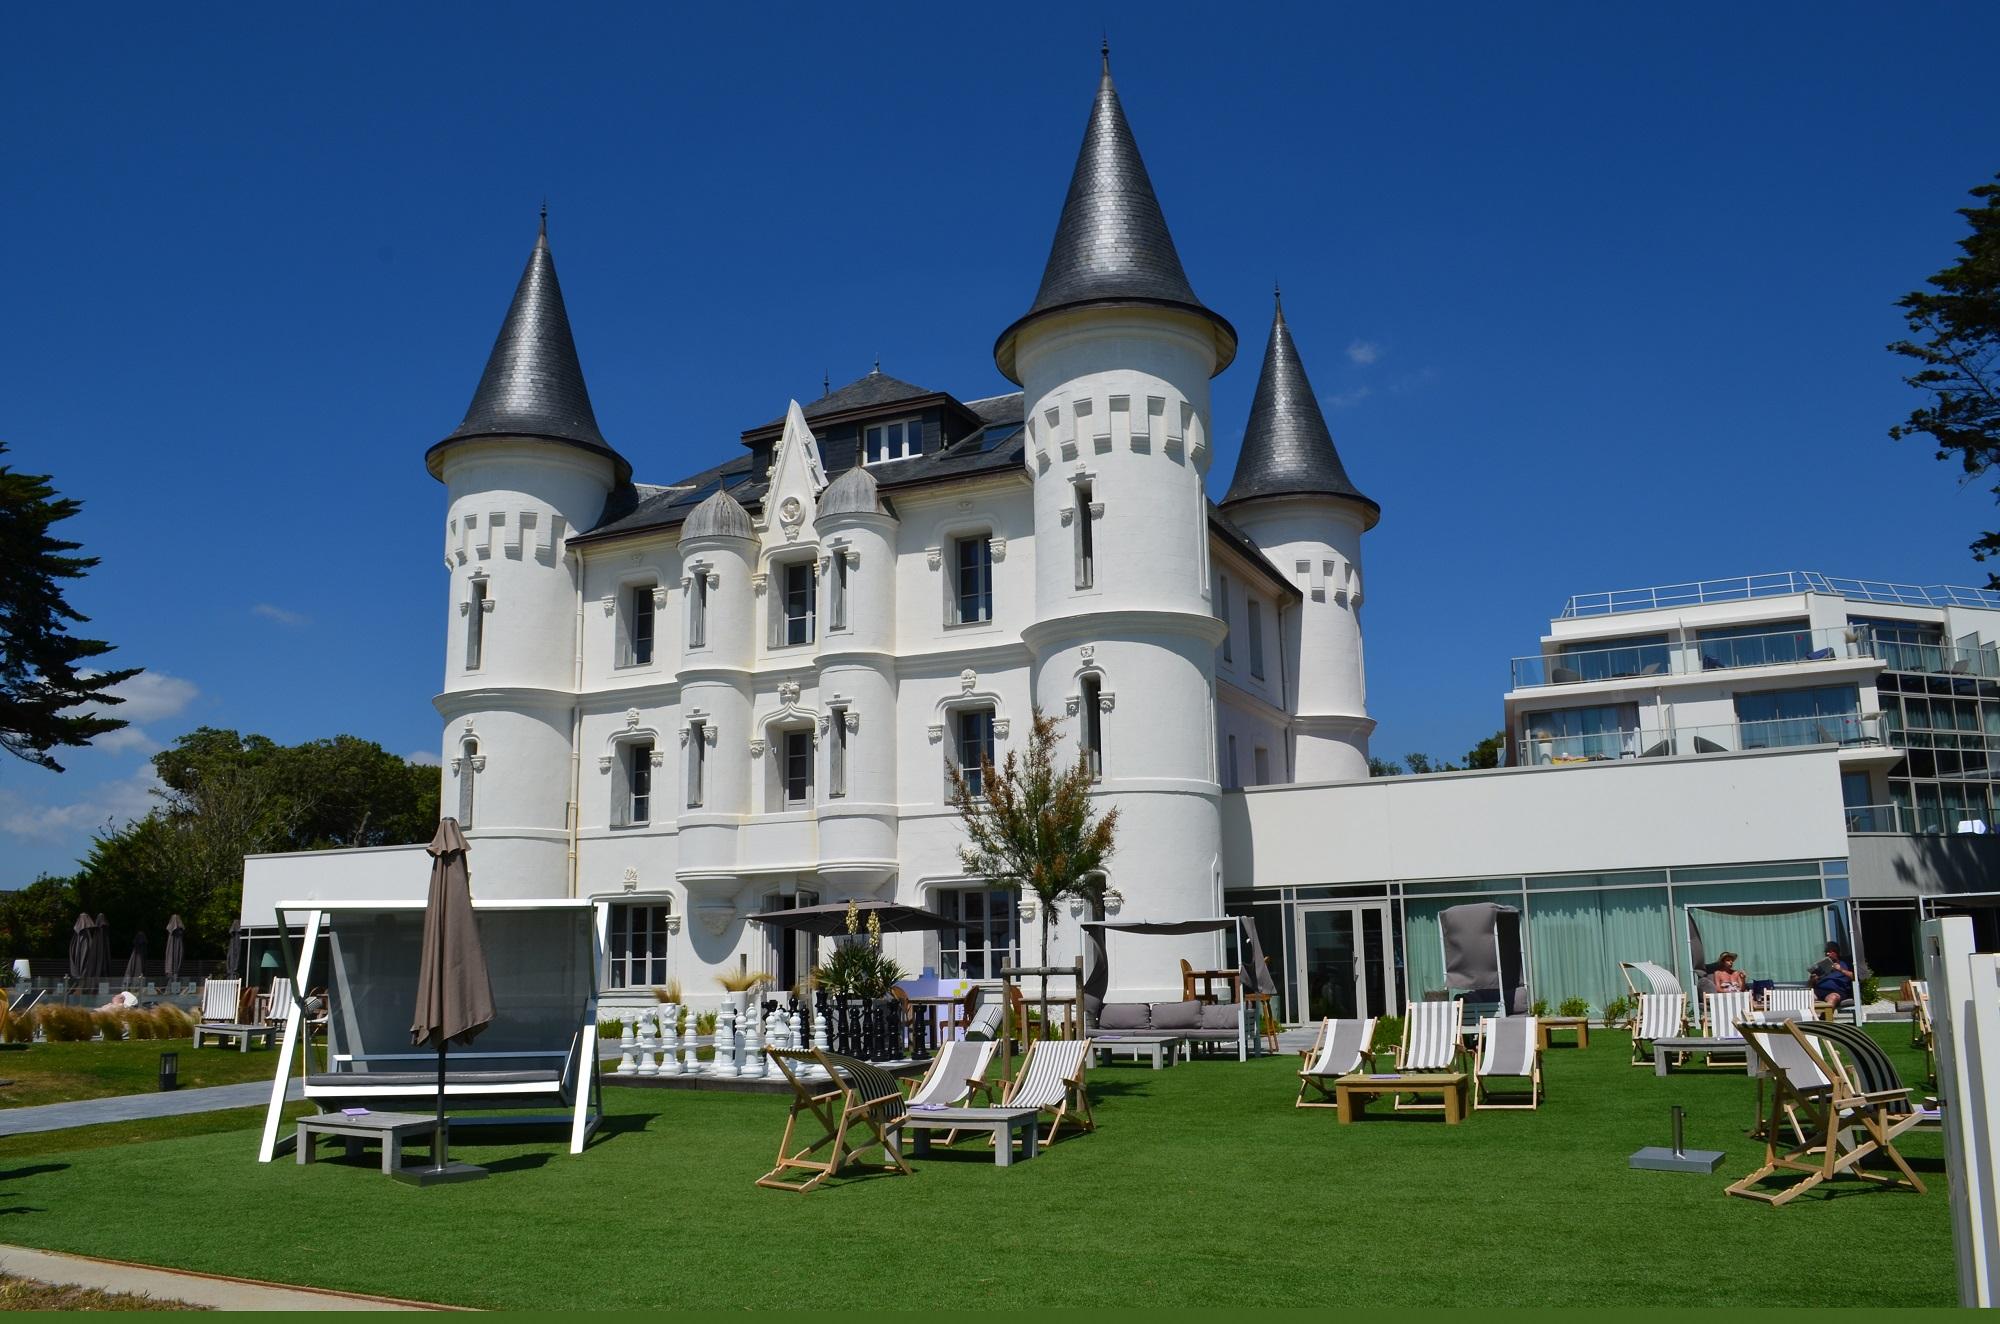 Chateau tourelles.jpg